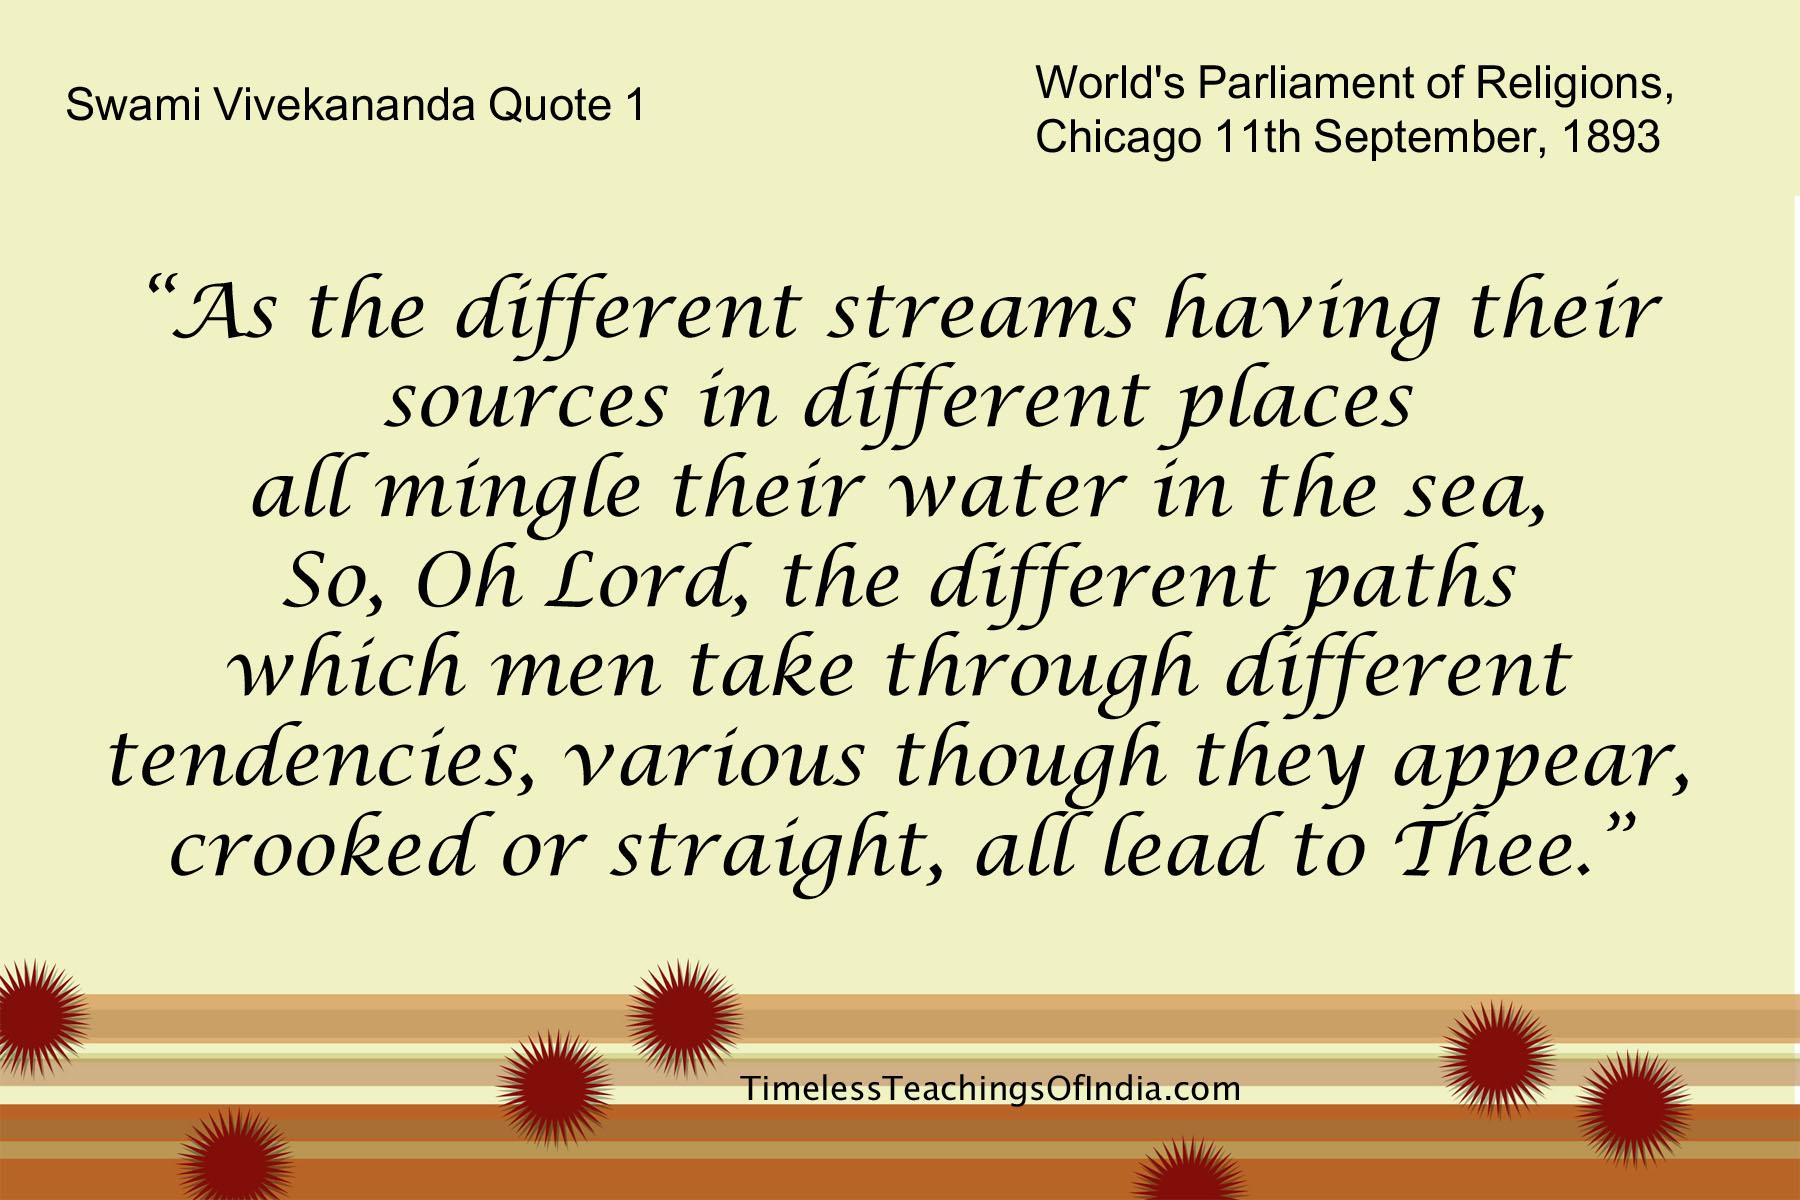 Vivekananda Quote 1